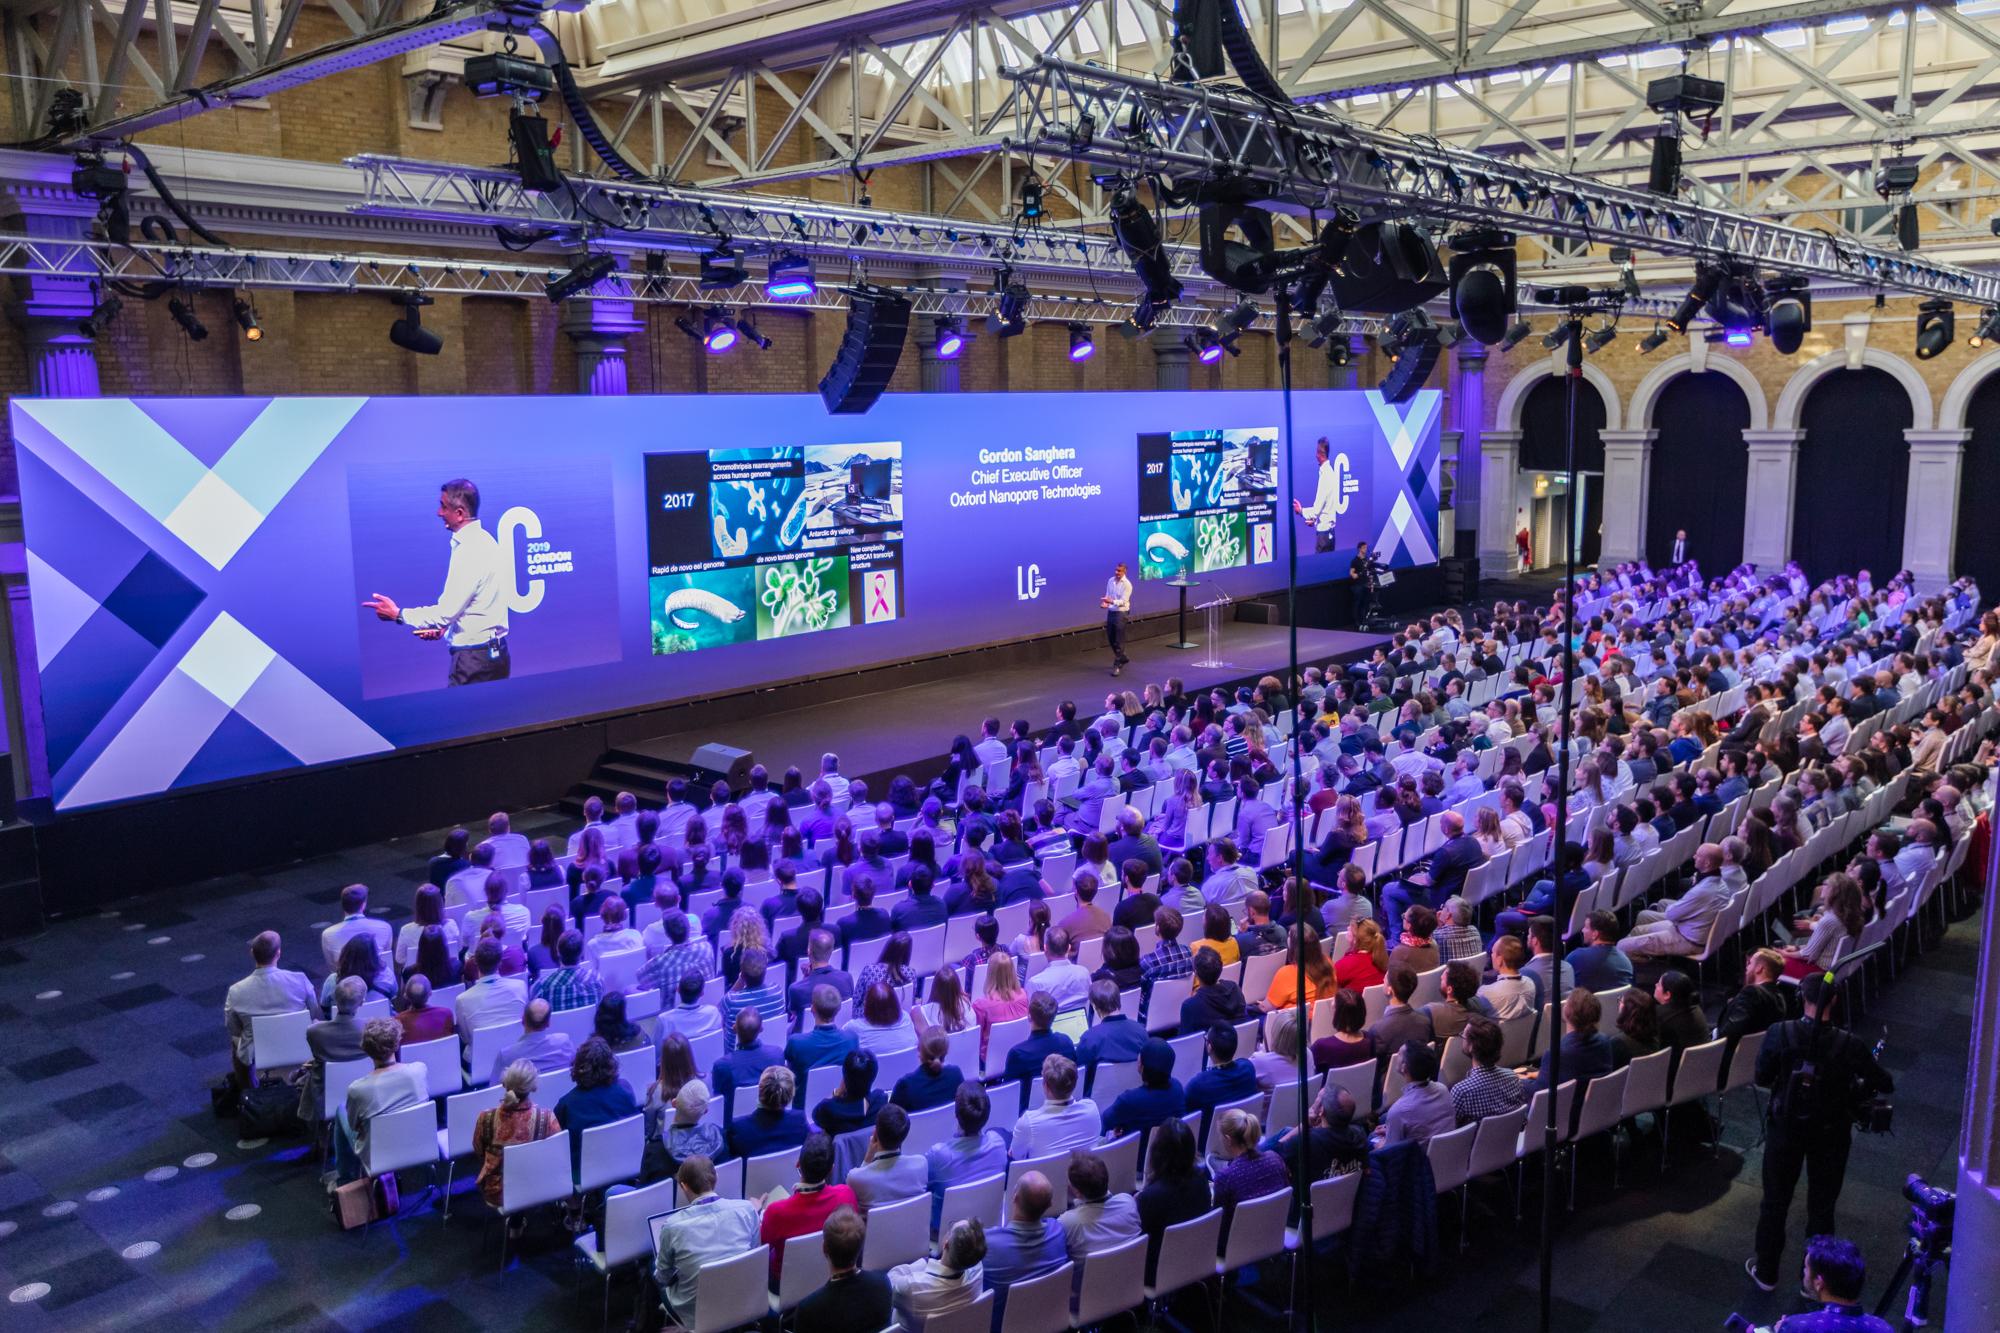 London Calling 2019 day 1: RNA base modification